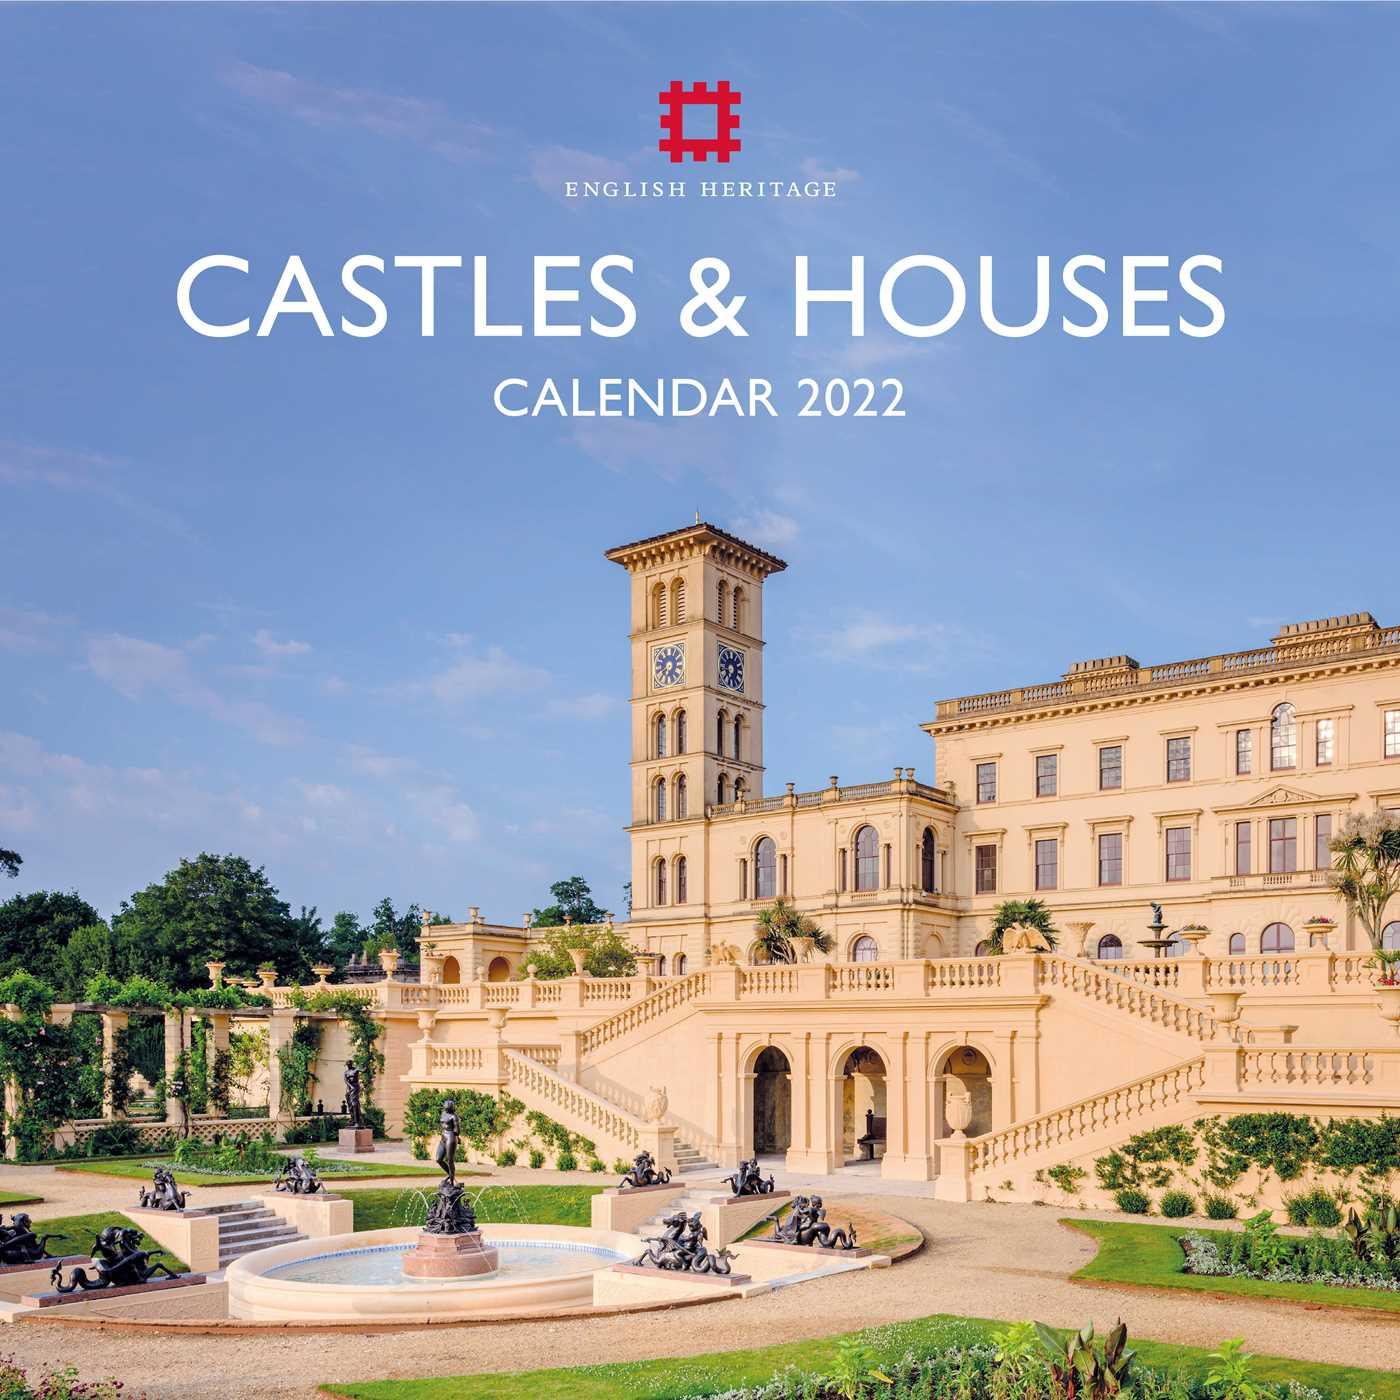 Dartmouth Calendar 2022.English Heritage Castles And Houses Wall Calendar 2022 Art Calendar Book Summary Video Official Publisher Page Simon Schuster